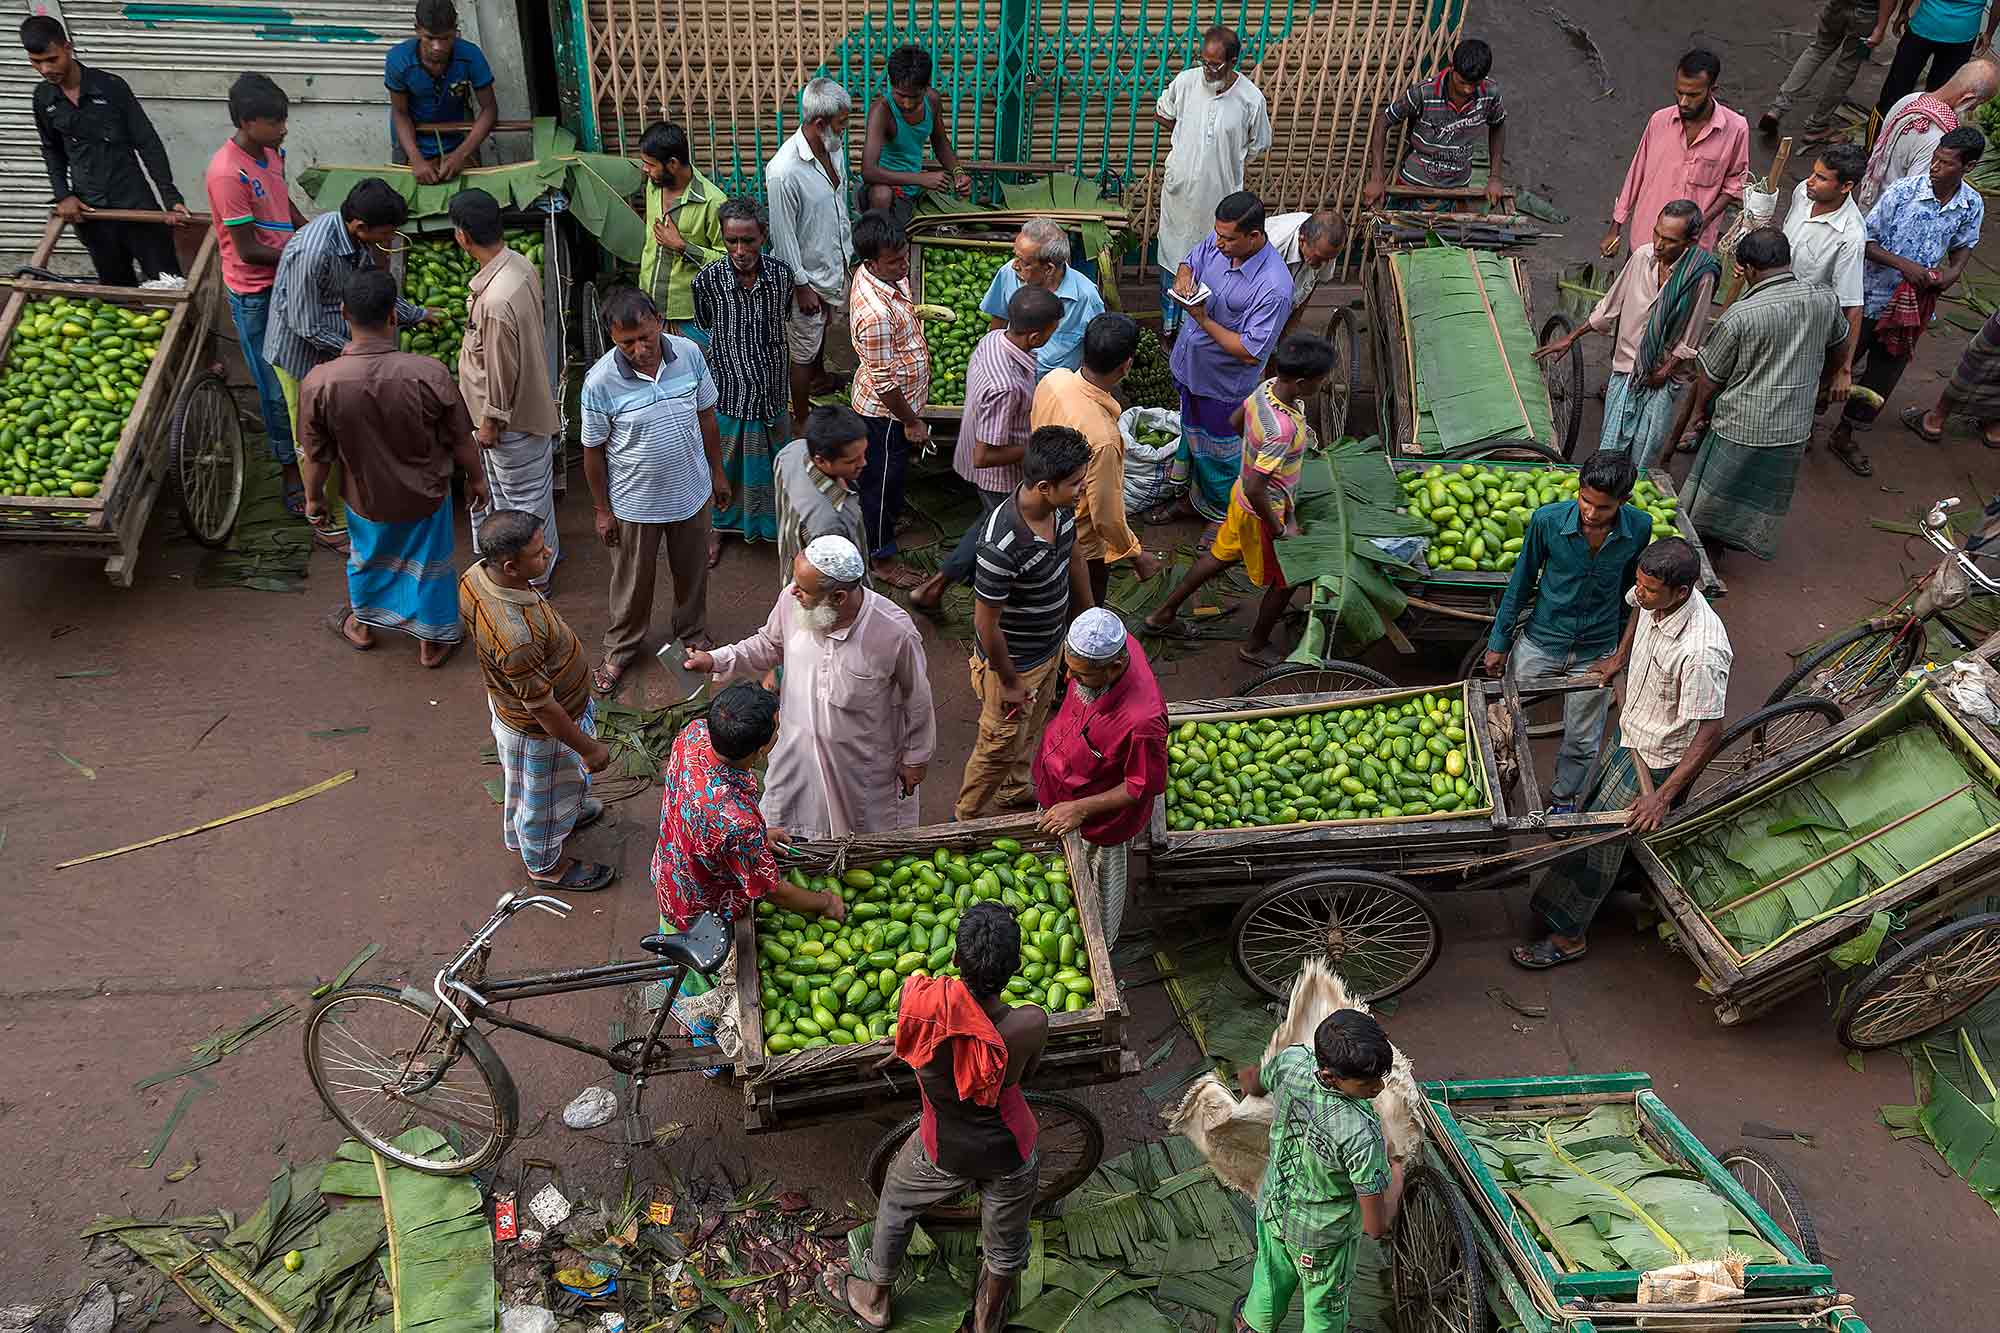 Markt life in Sreemangal, Bangladesh. © Ulli Maier & Nisa Maier